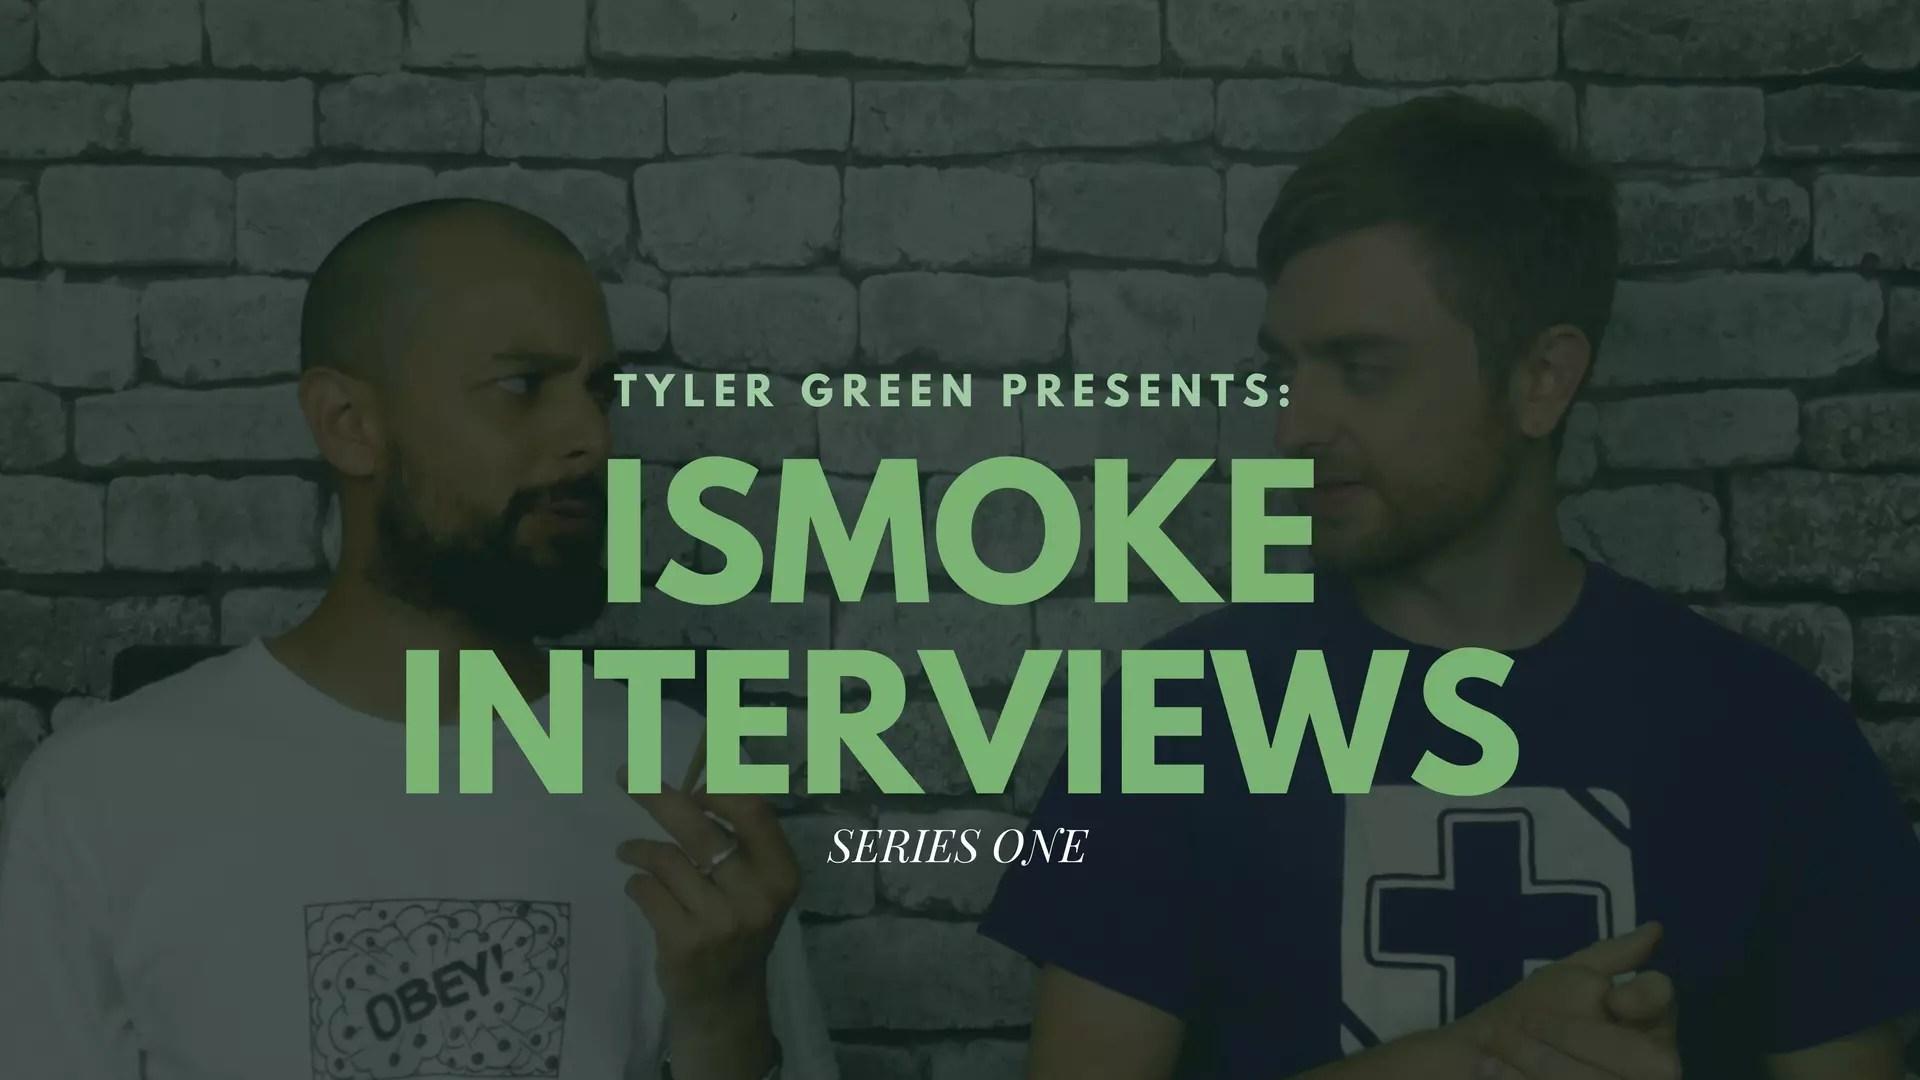 ISMOKE Interviews Series 1